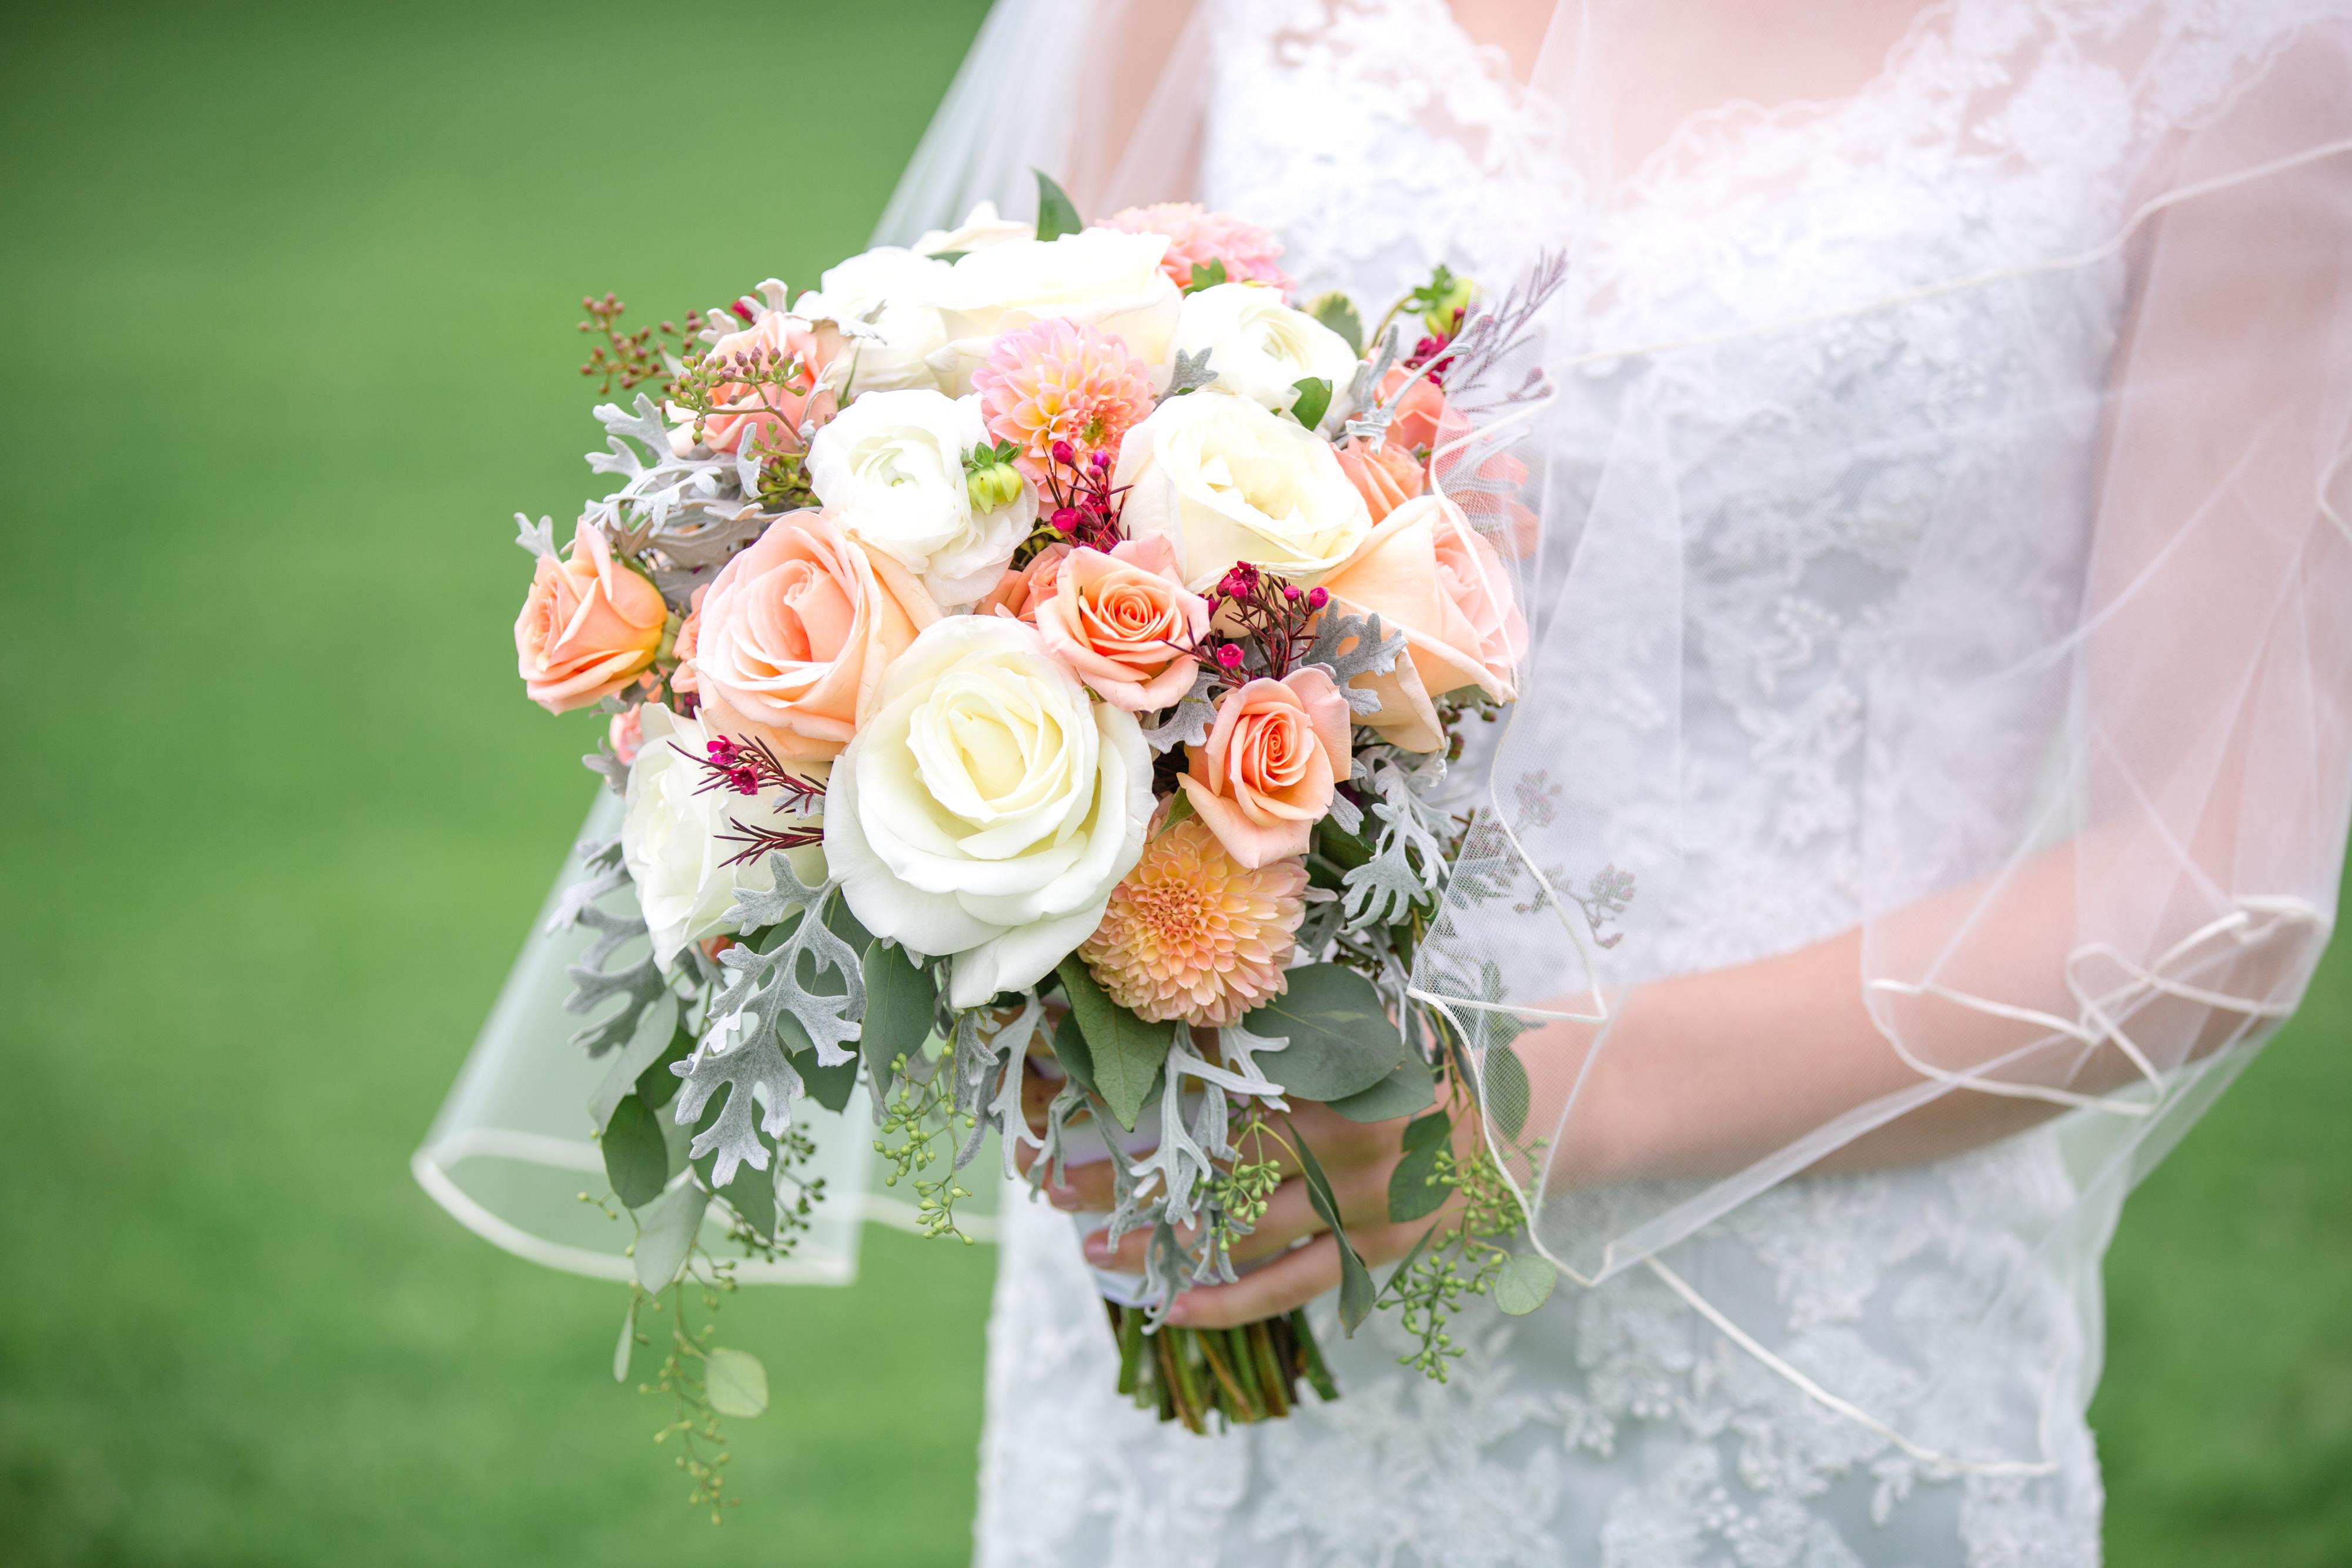 Emilee Janitz holds her wedding bouquet.